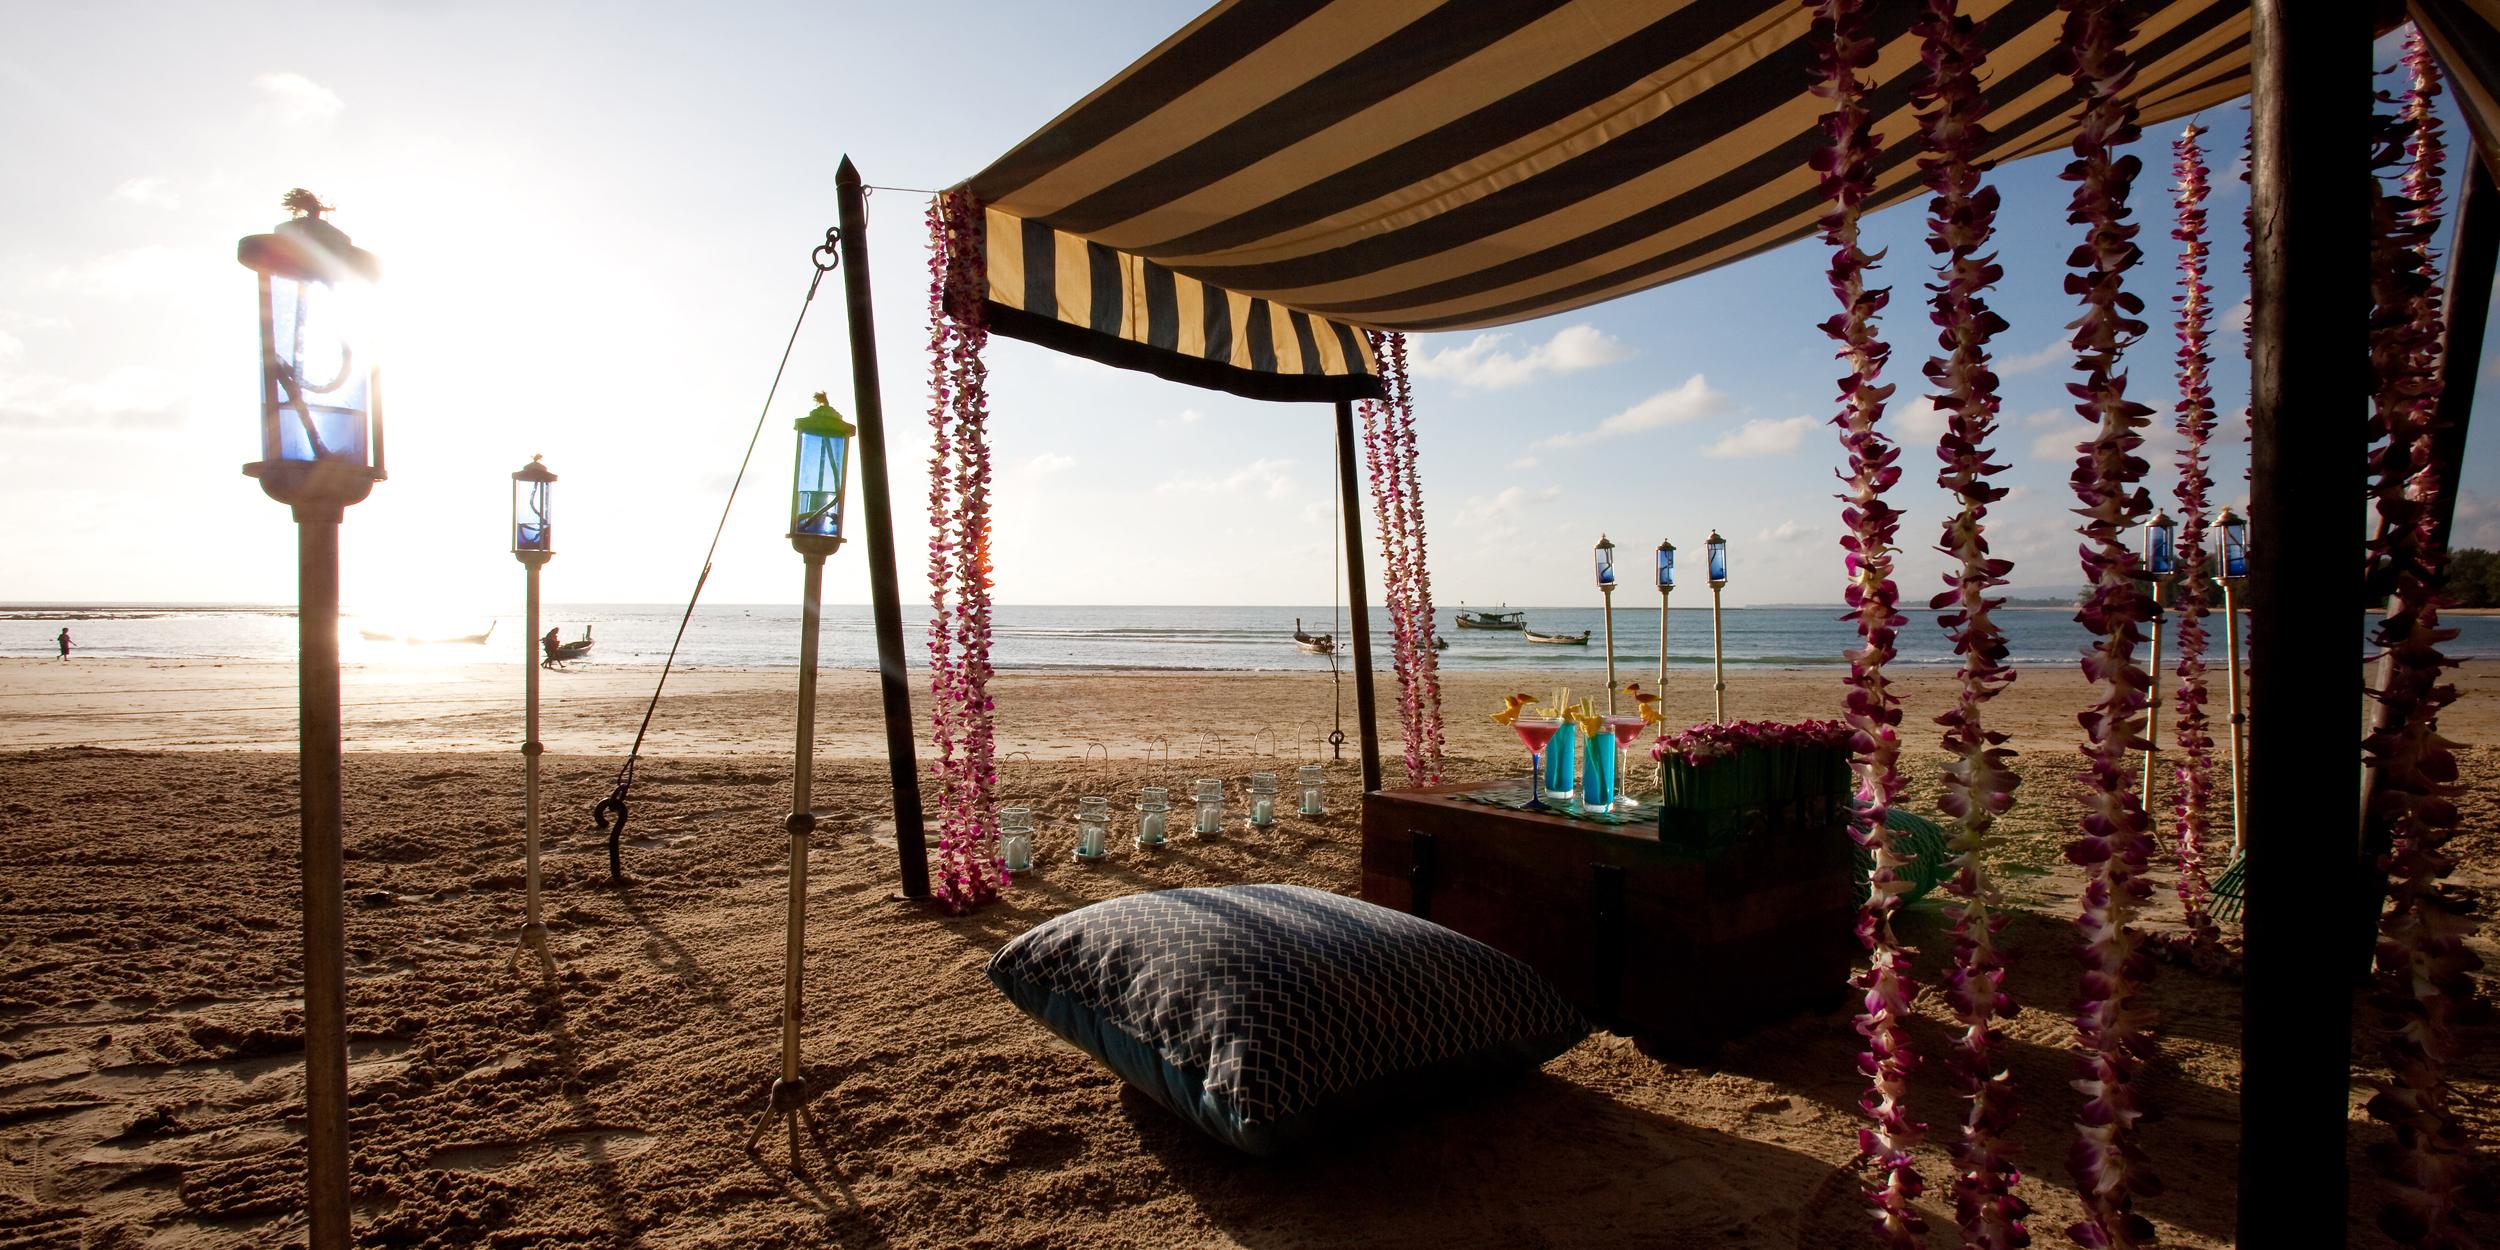 hotell indigo pearl phuket thailand phuket thailand. Black Bedroom Furniture Sets. Home Design Ideas